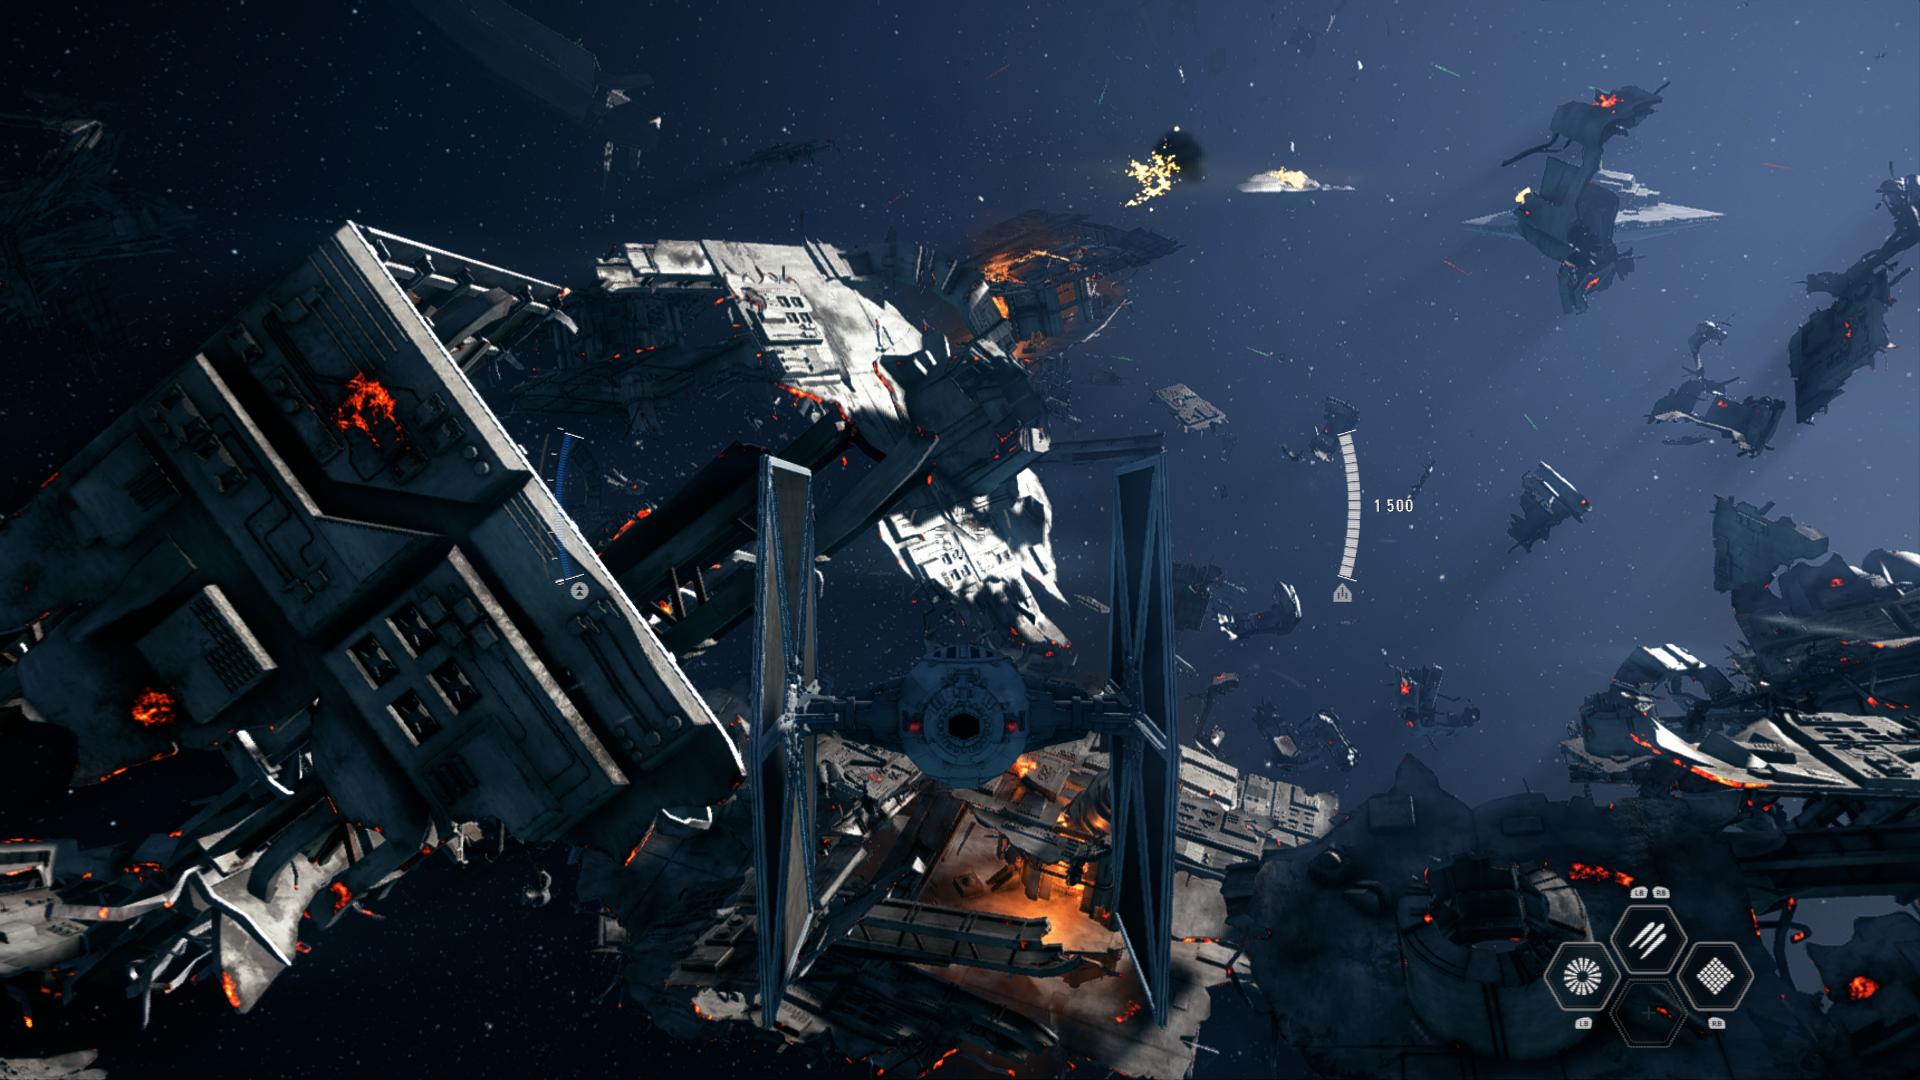 test star wars battlefront 2 combats spatiaux geeketc